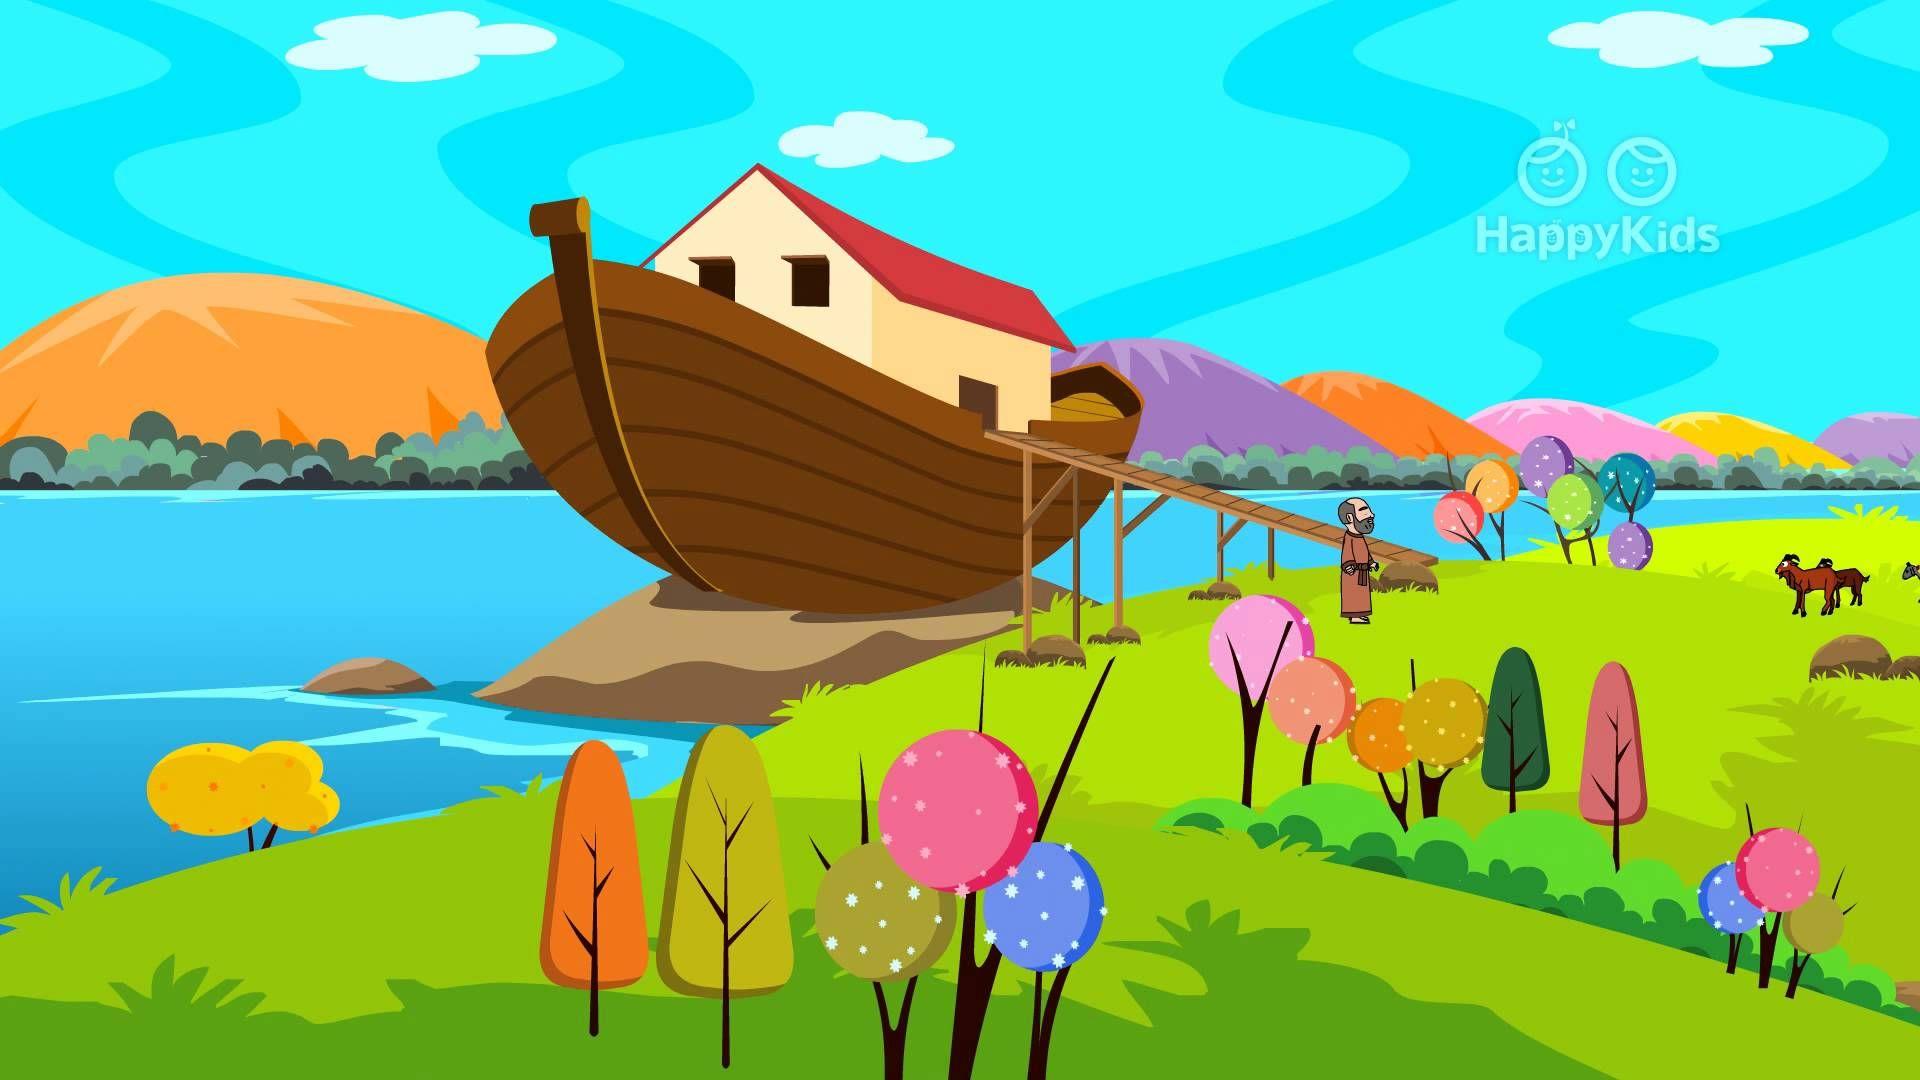 noahsobedience an animated short video clip to teach our children